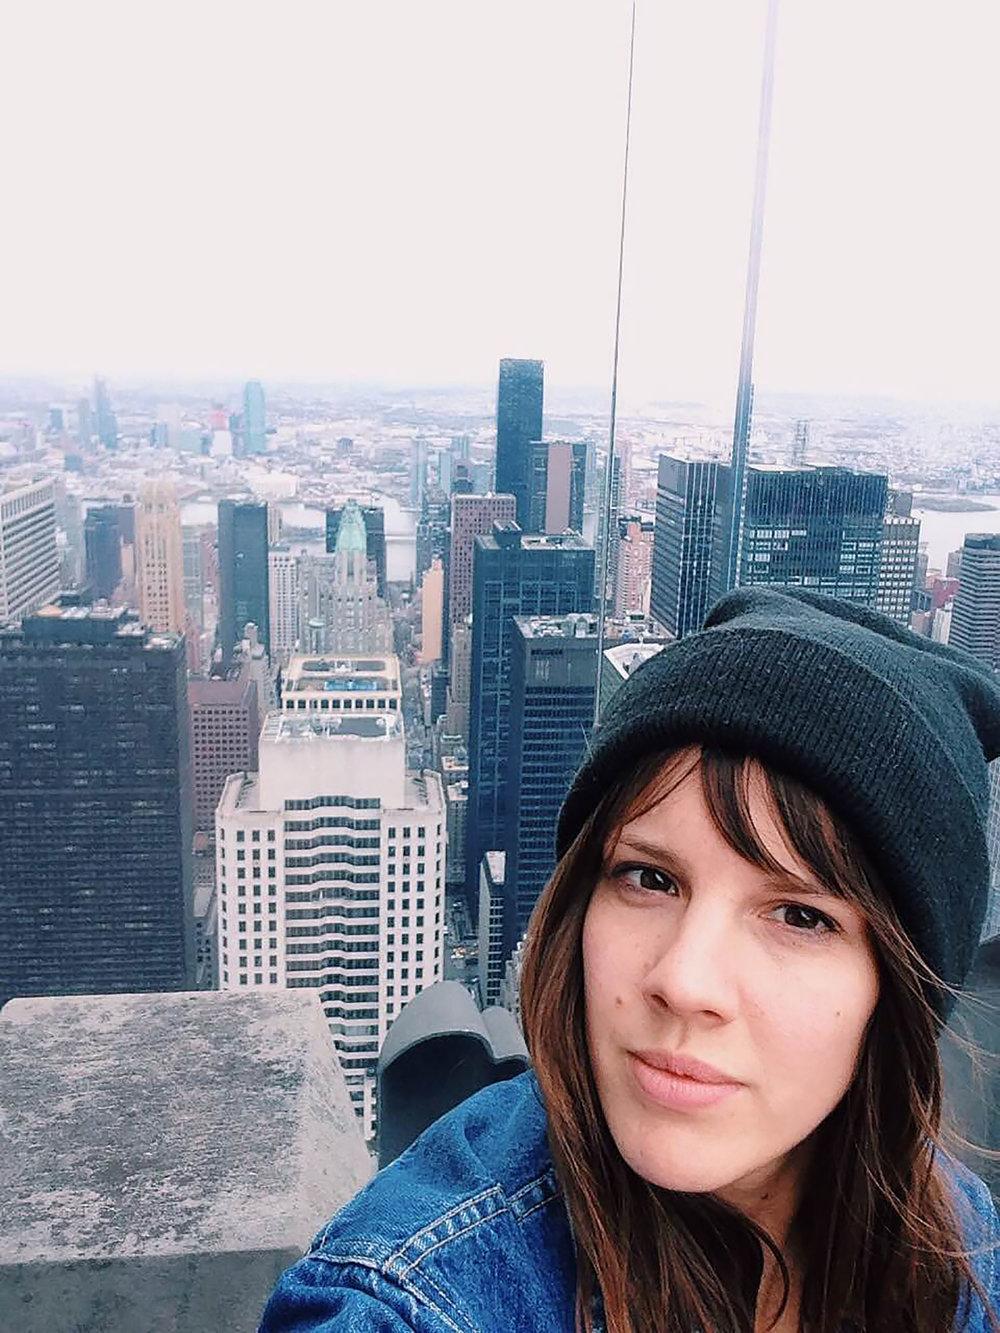 Janelle Bendycki, Pittsburgh Photographer extraodinaire